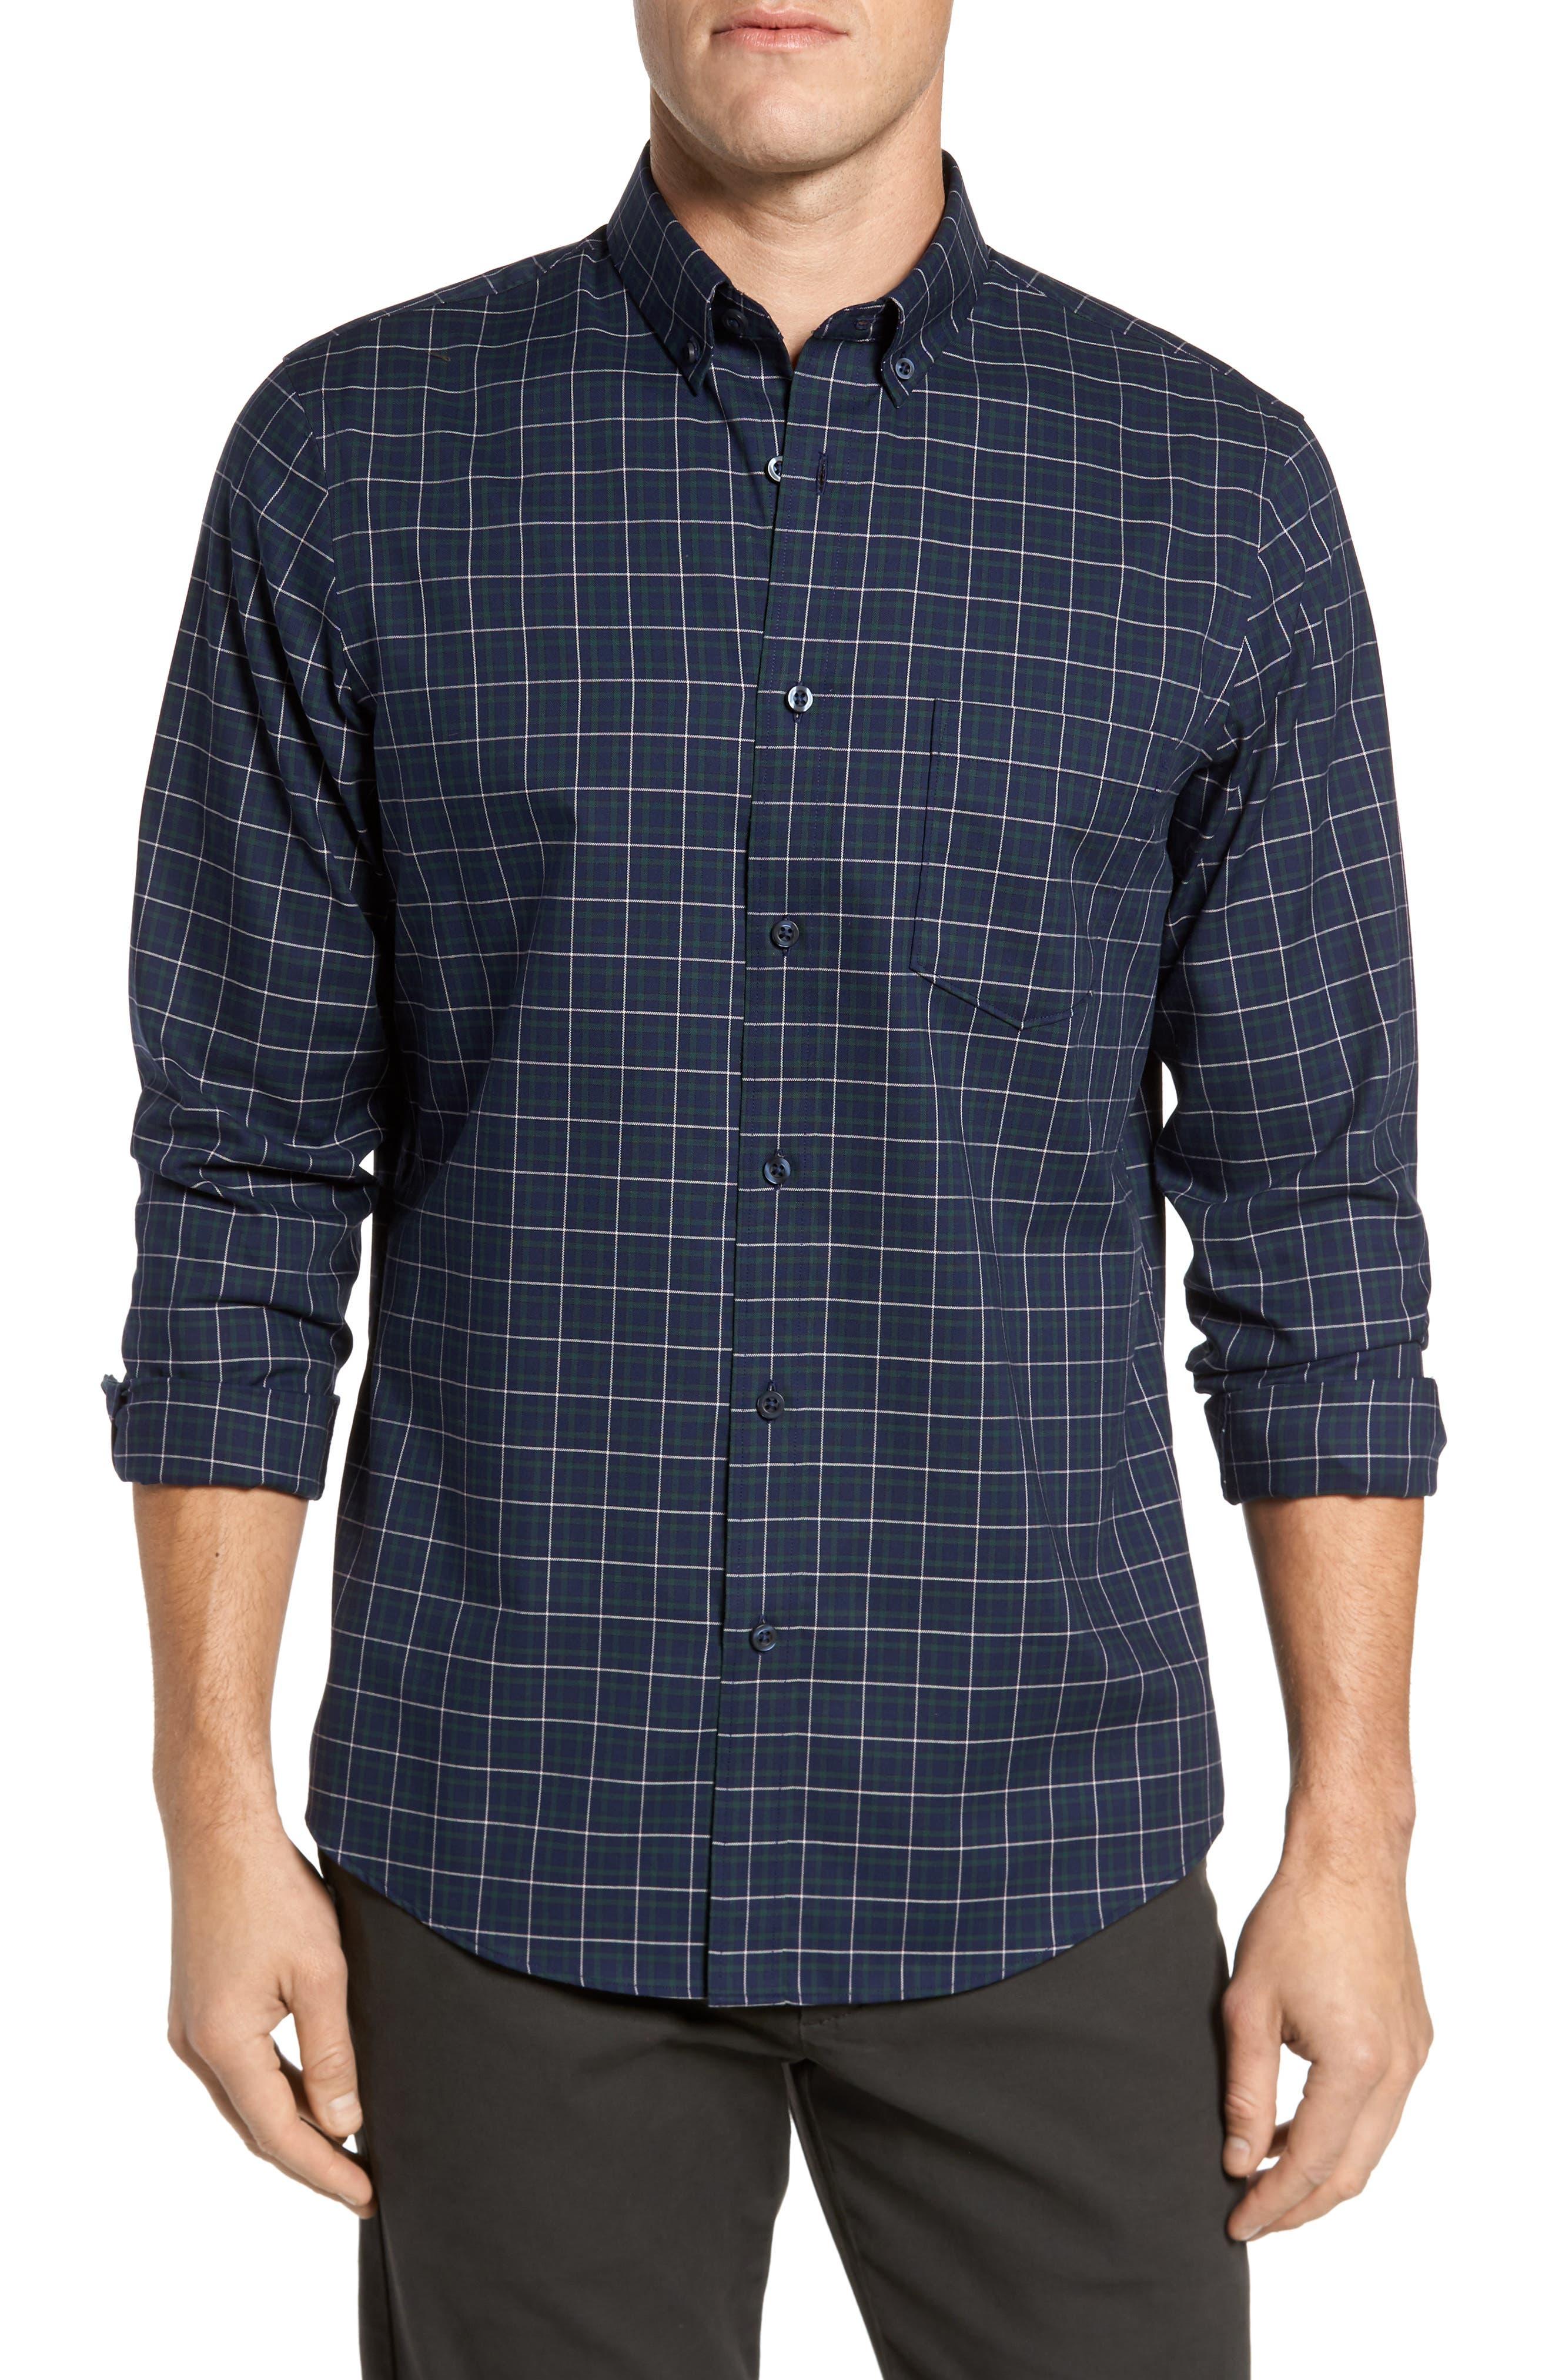 Main Image - Nordstrom Men's Shop Regular Fit Non-Iron Plaid Sport Shirt